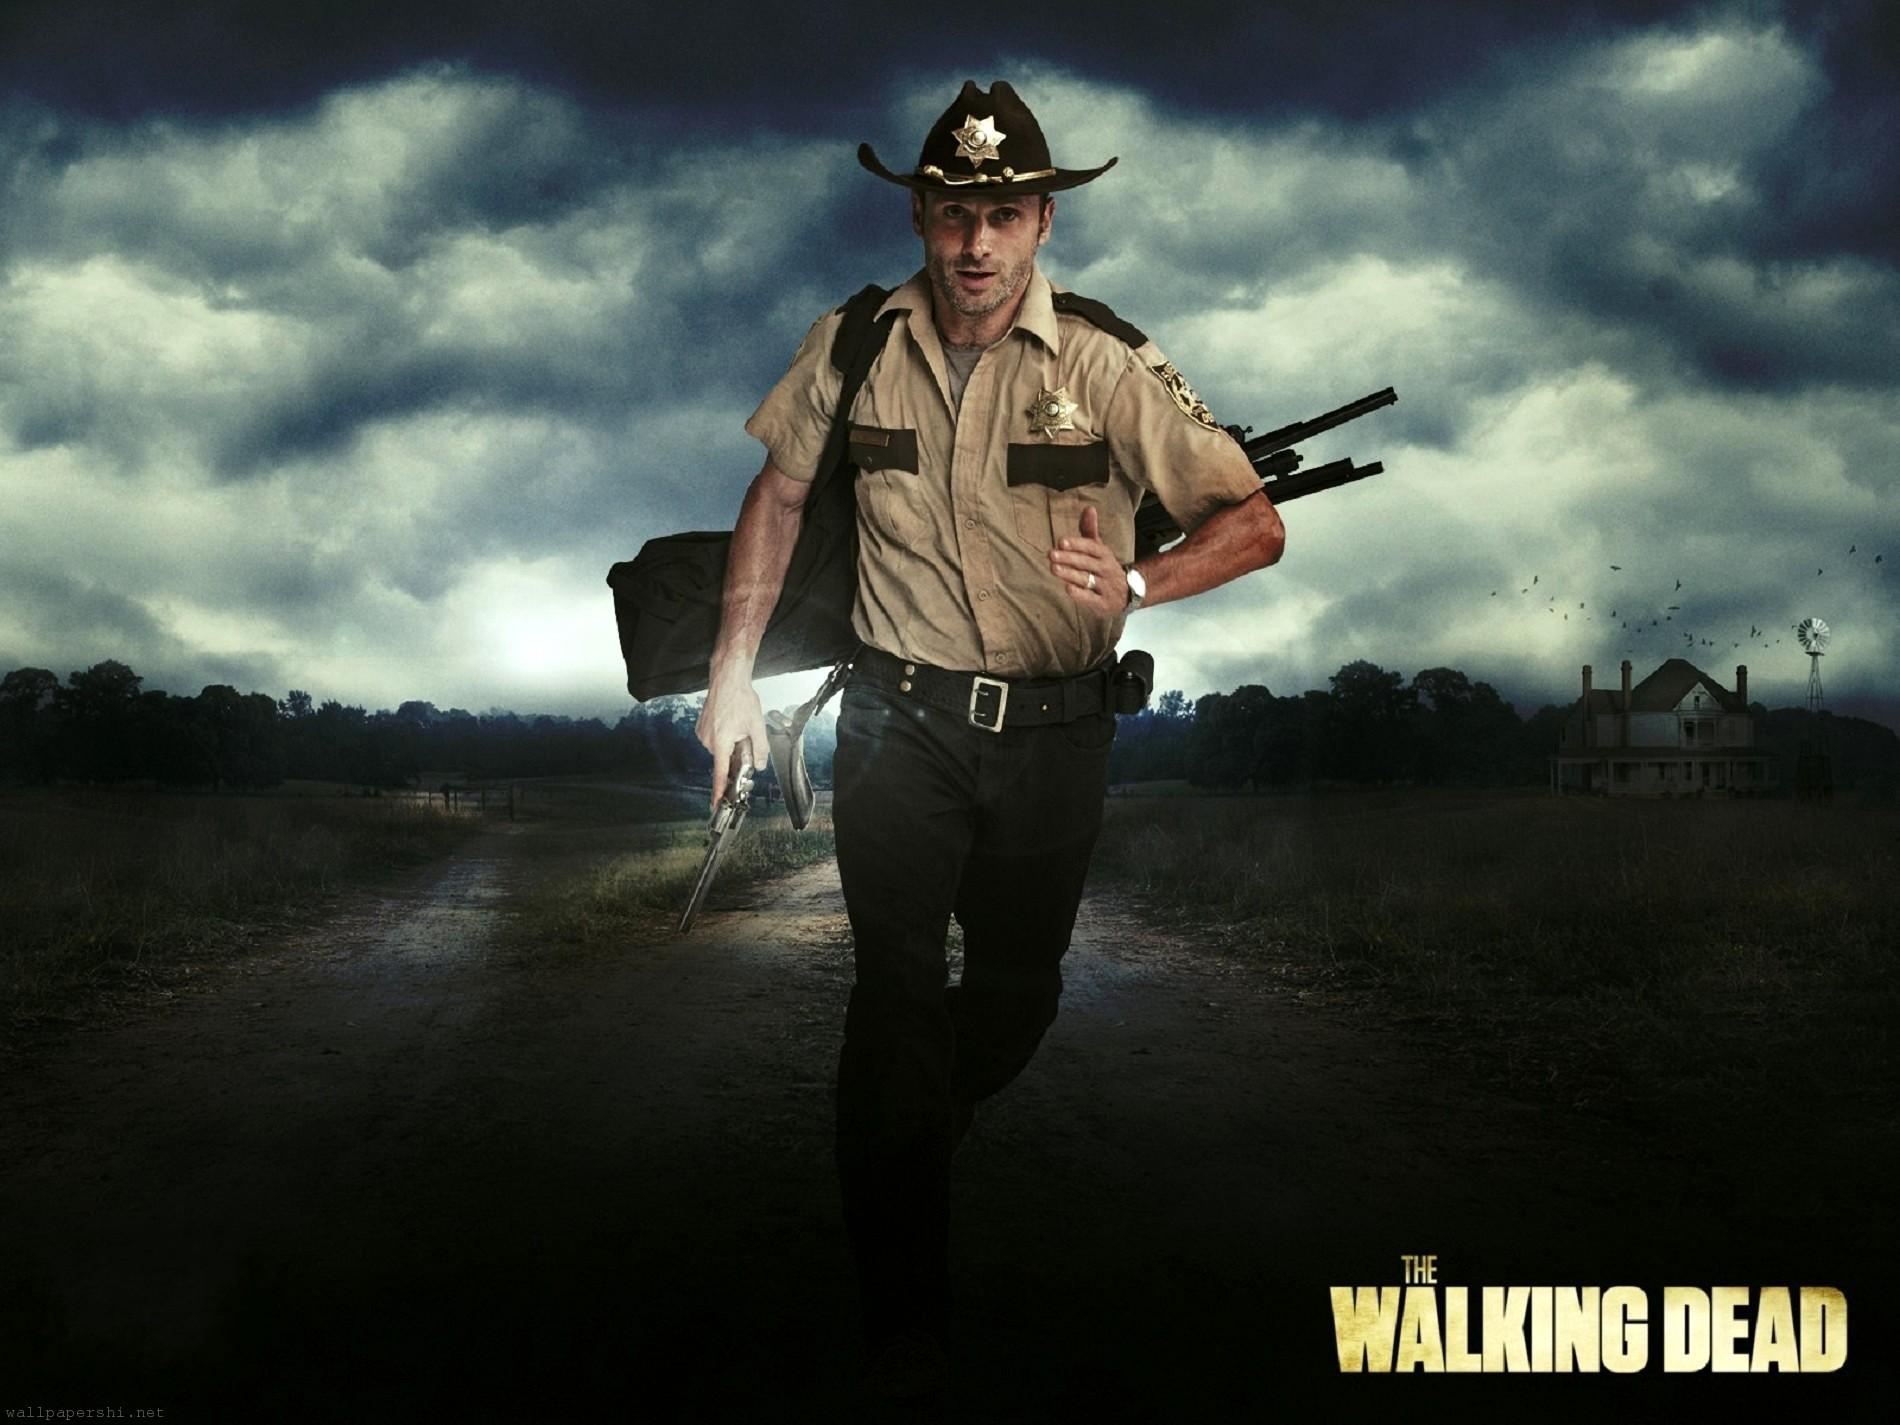 The Walking Dead Wallpapers: Screensavers And Wallpaper Walking Dead